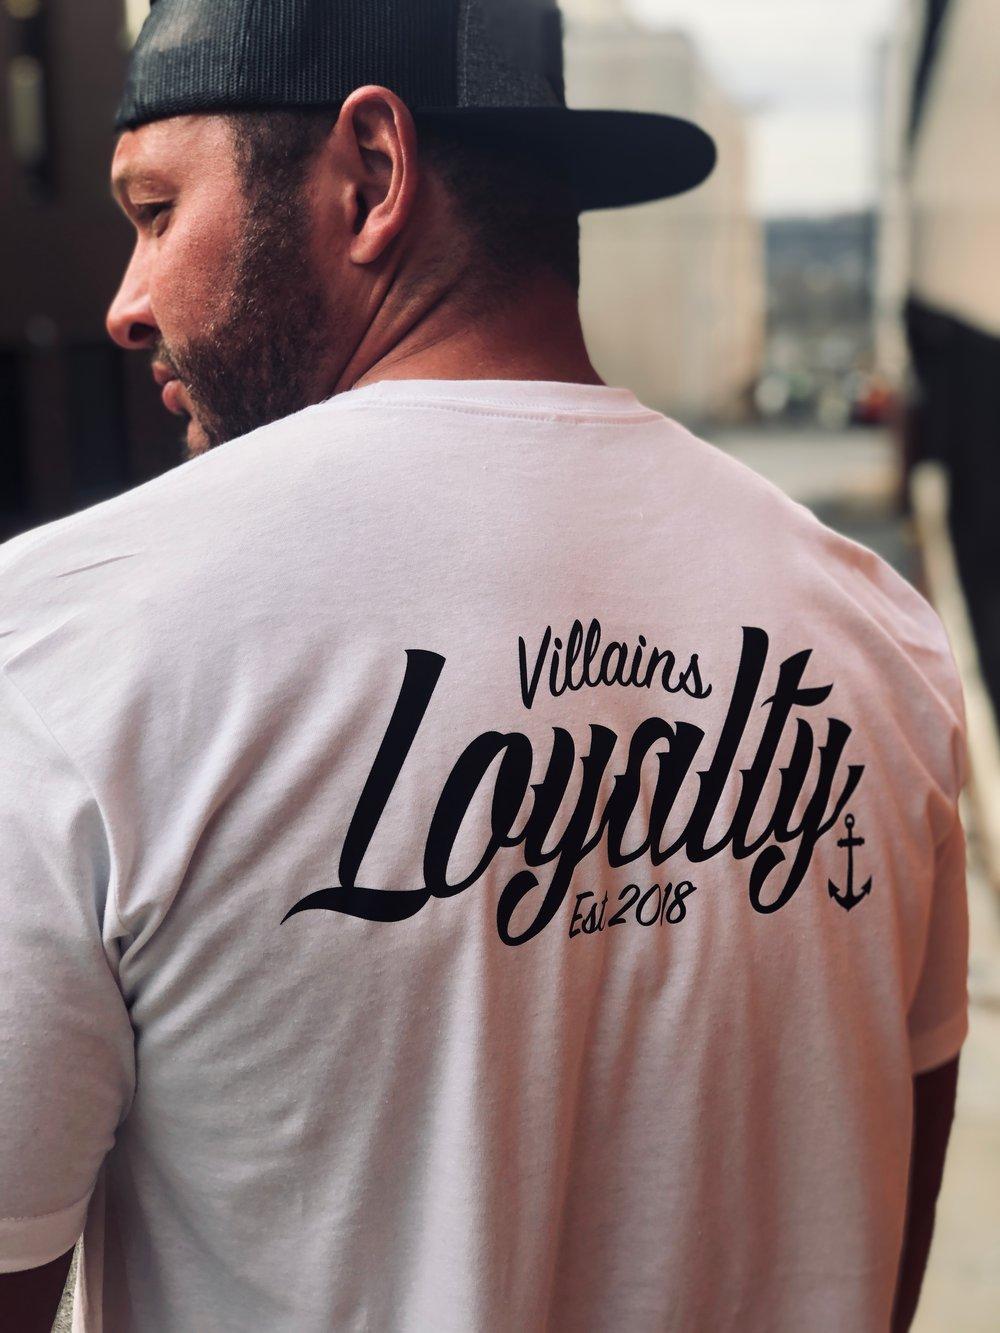 Villains loyalty white tee